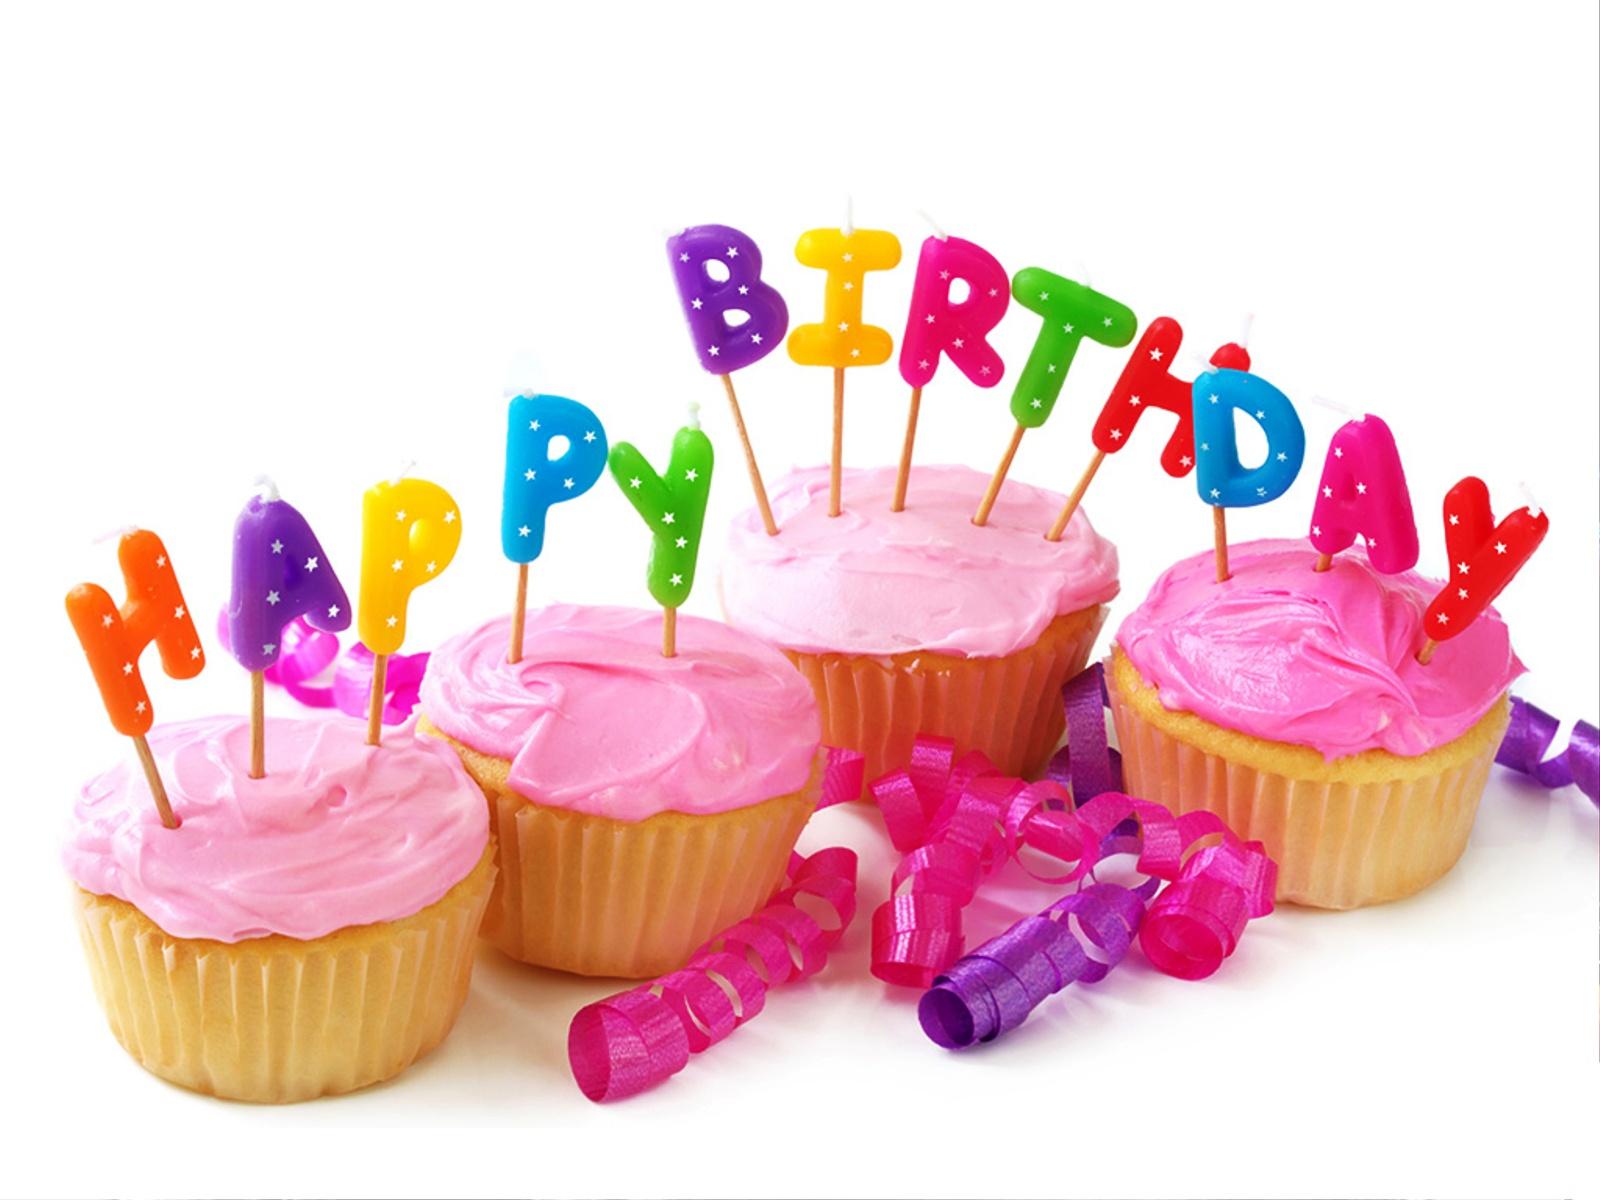 Birthday Cake Images Free Birthdaycake Wallgator Com Wp Content